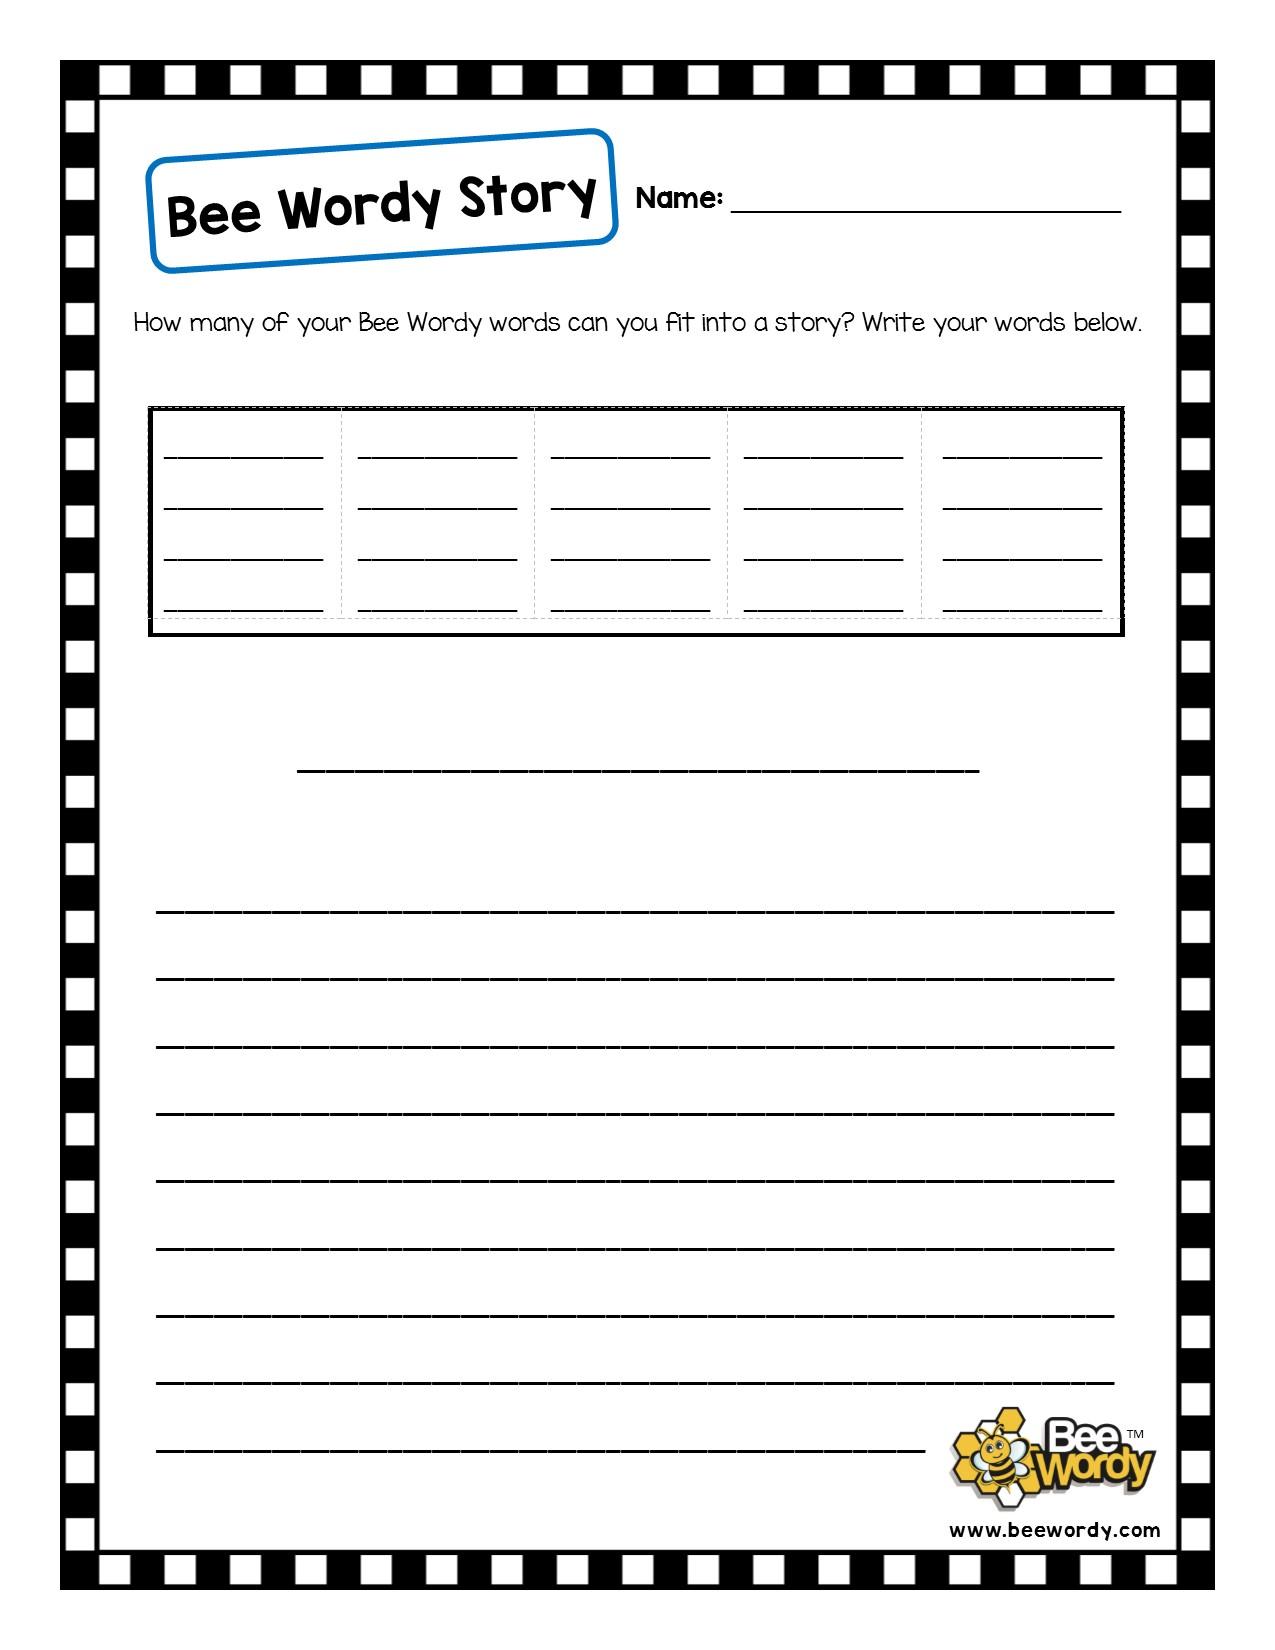 BW Word Story.jpg